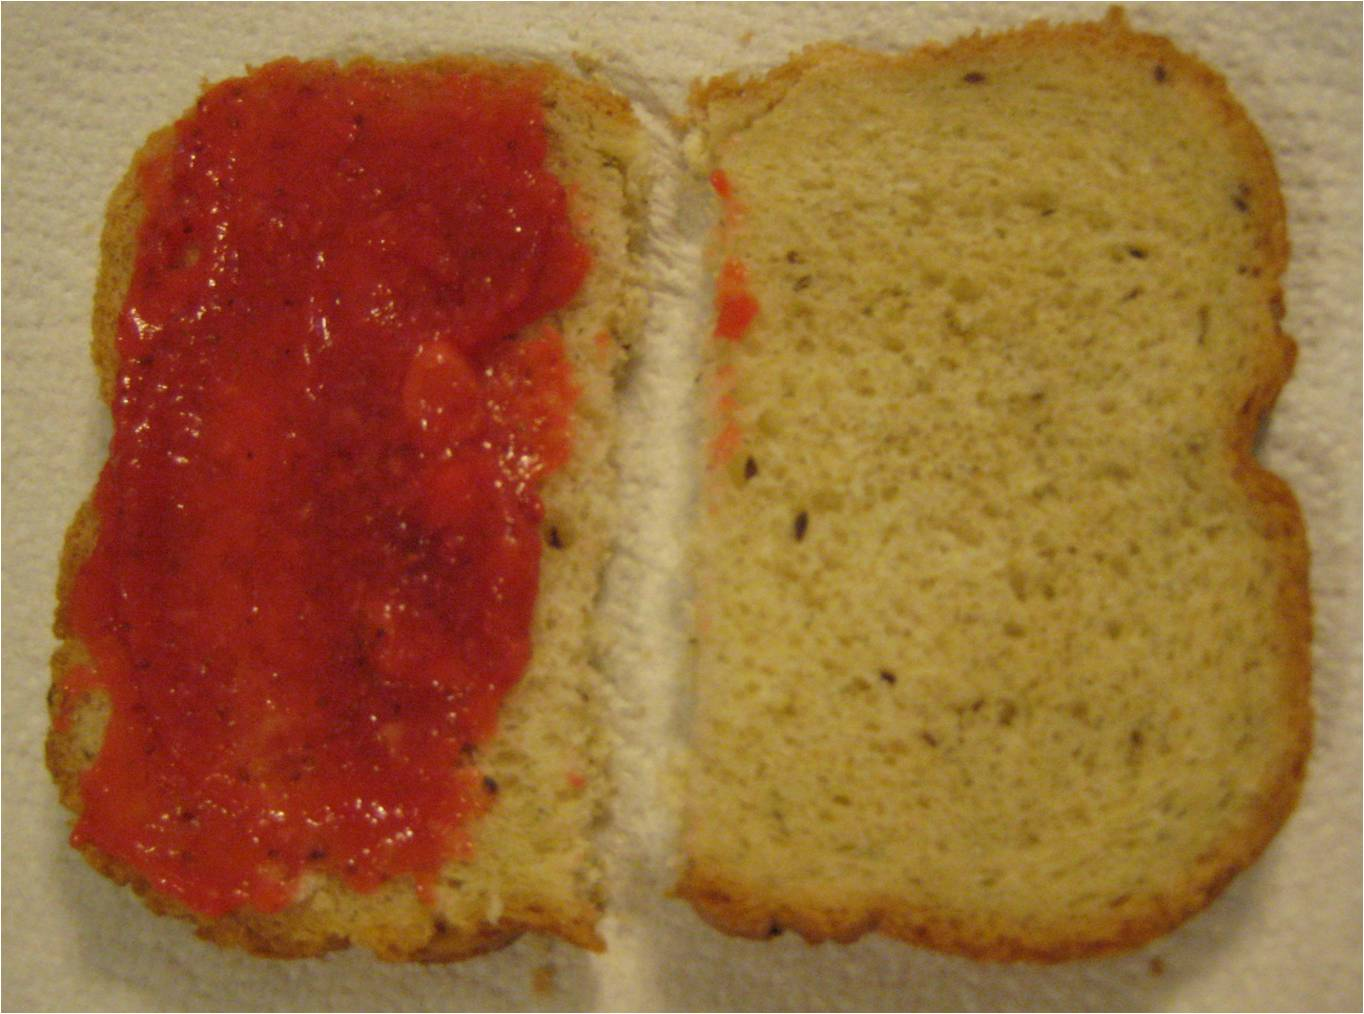 Jen's Honey Strawberry Freezer Jam